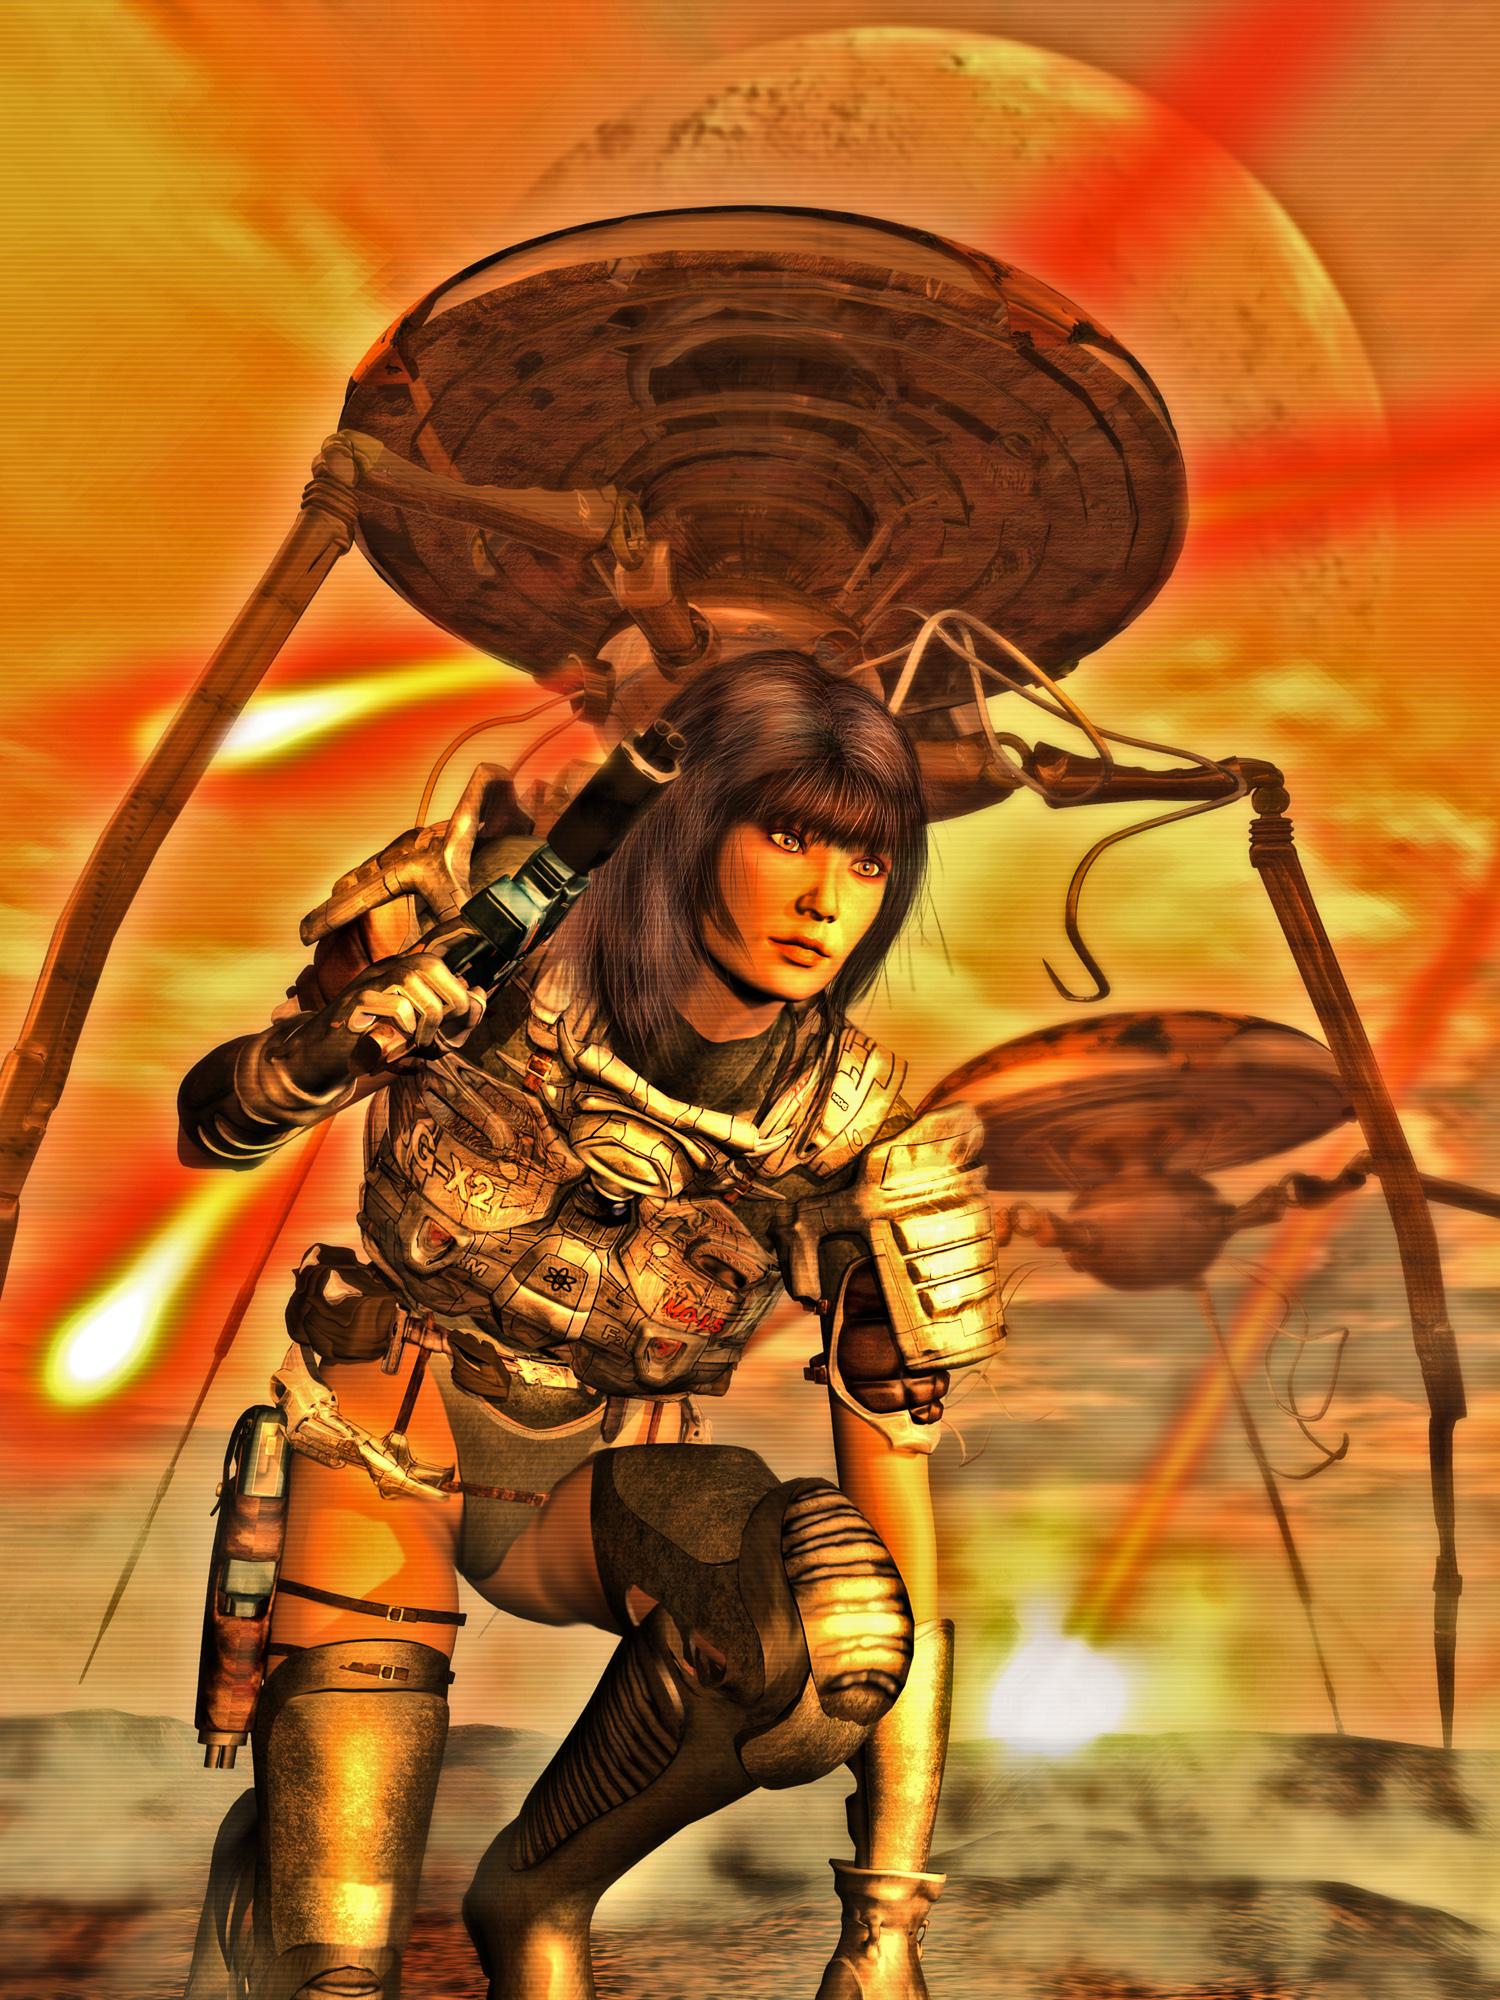 Space Warrior-artwork.jpg